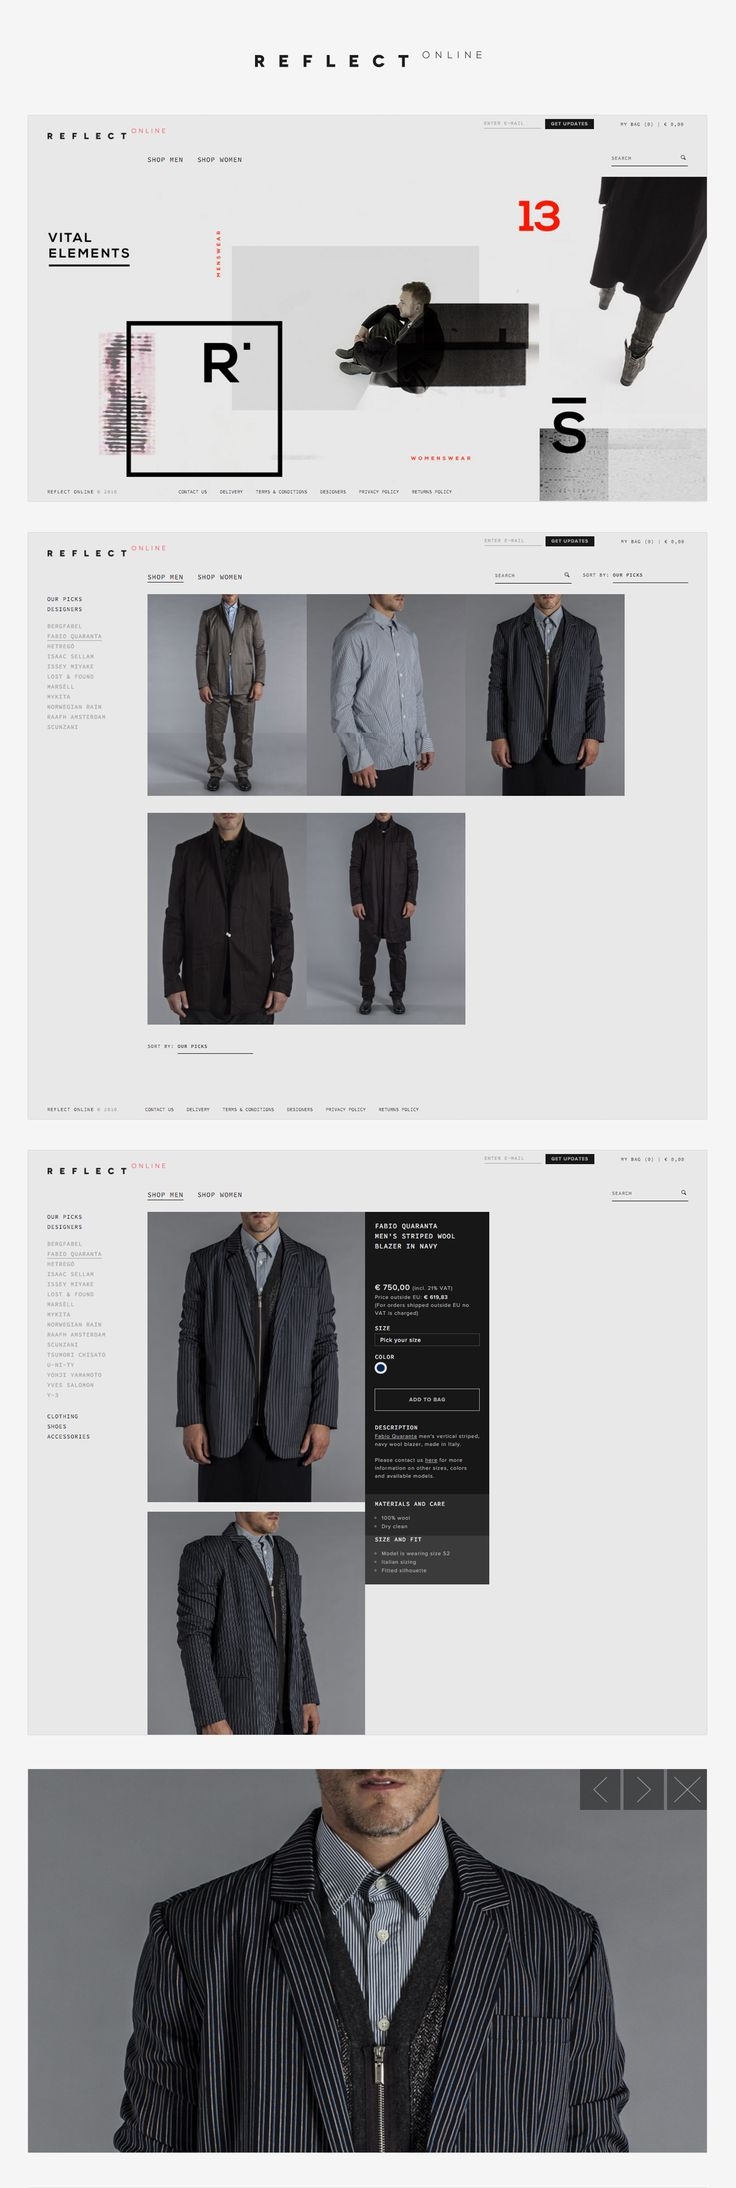 Reflect Online - webshop